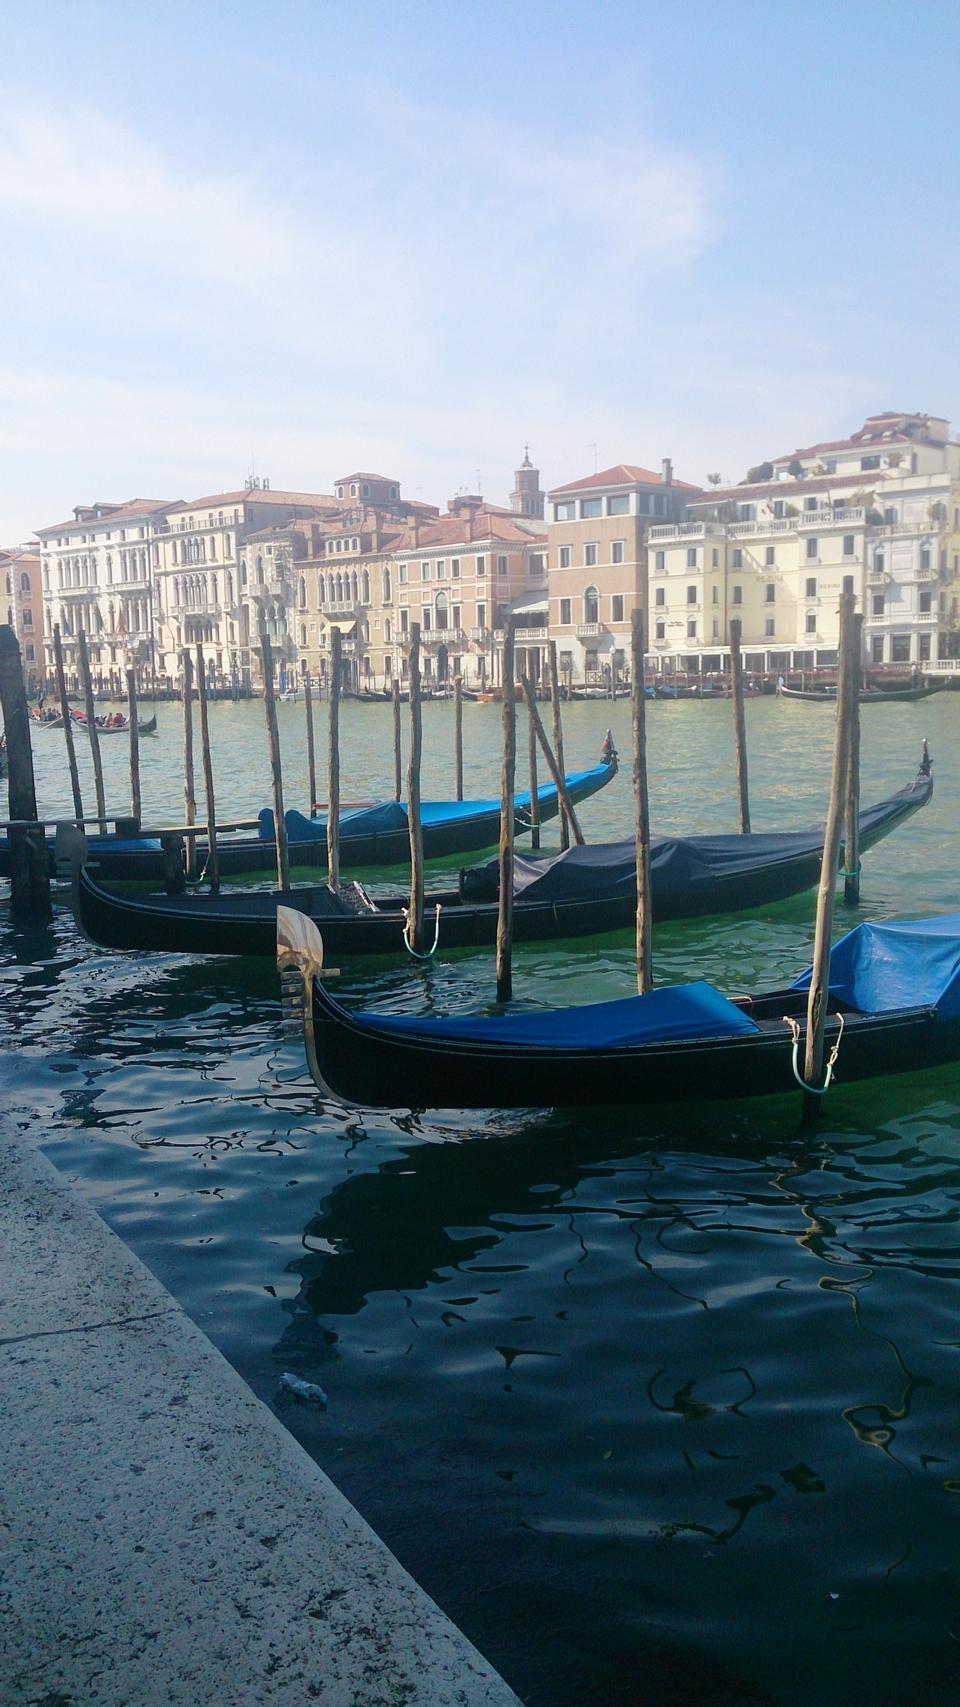 Grand Canal, Venise, bateau, gondole